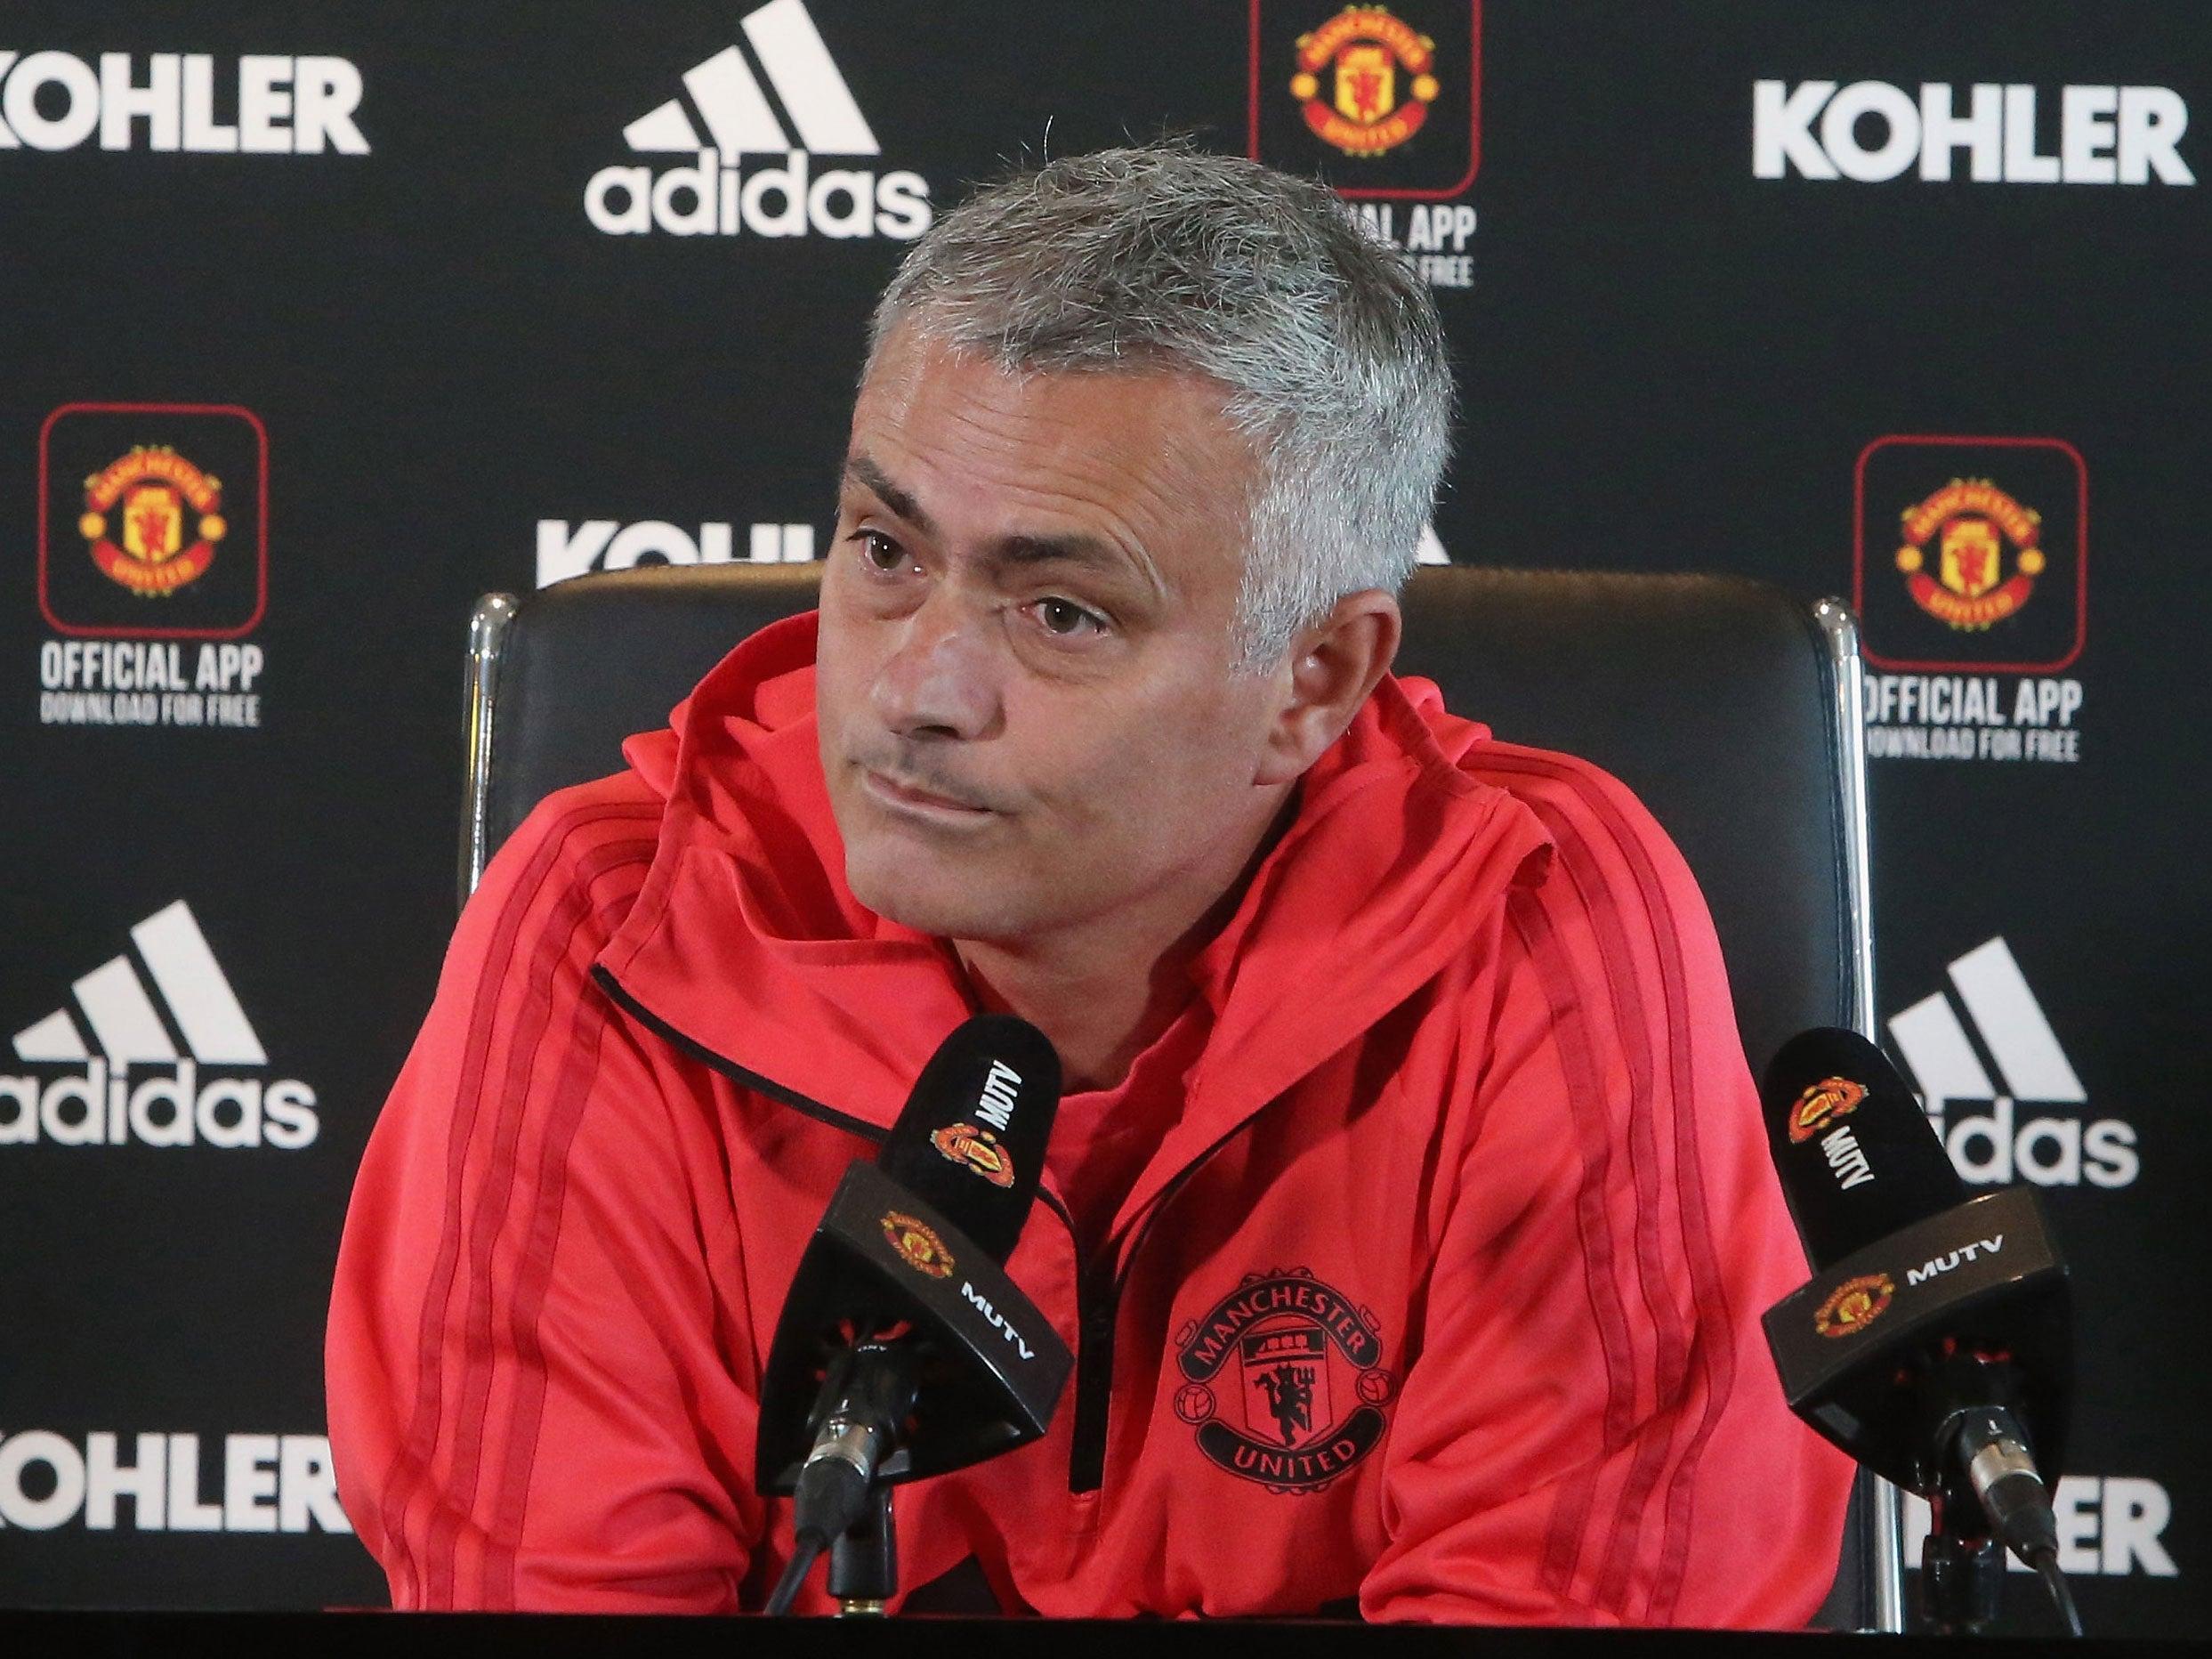 Manchester United manager Jose Mourinho claims Romelu Lukaku injury was behind Belgium trip